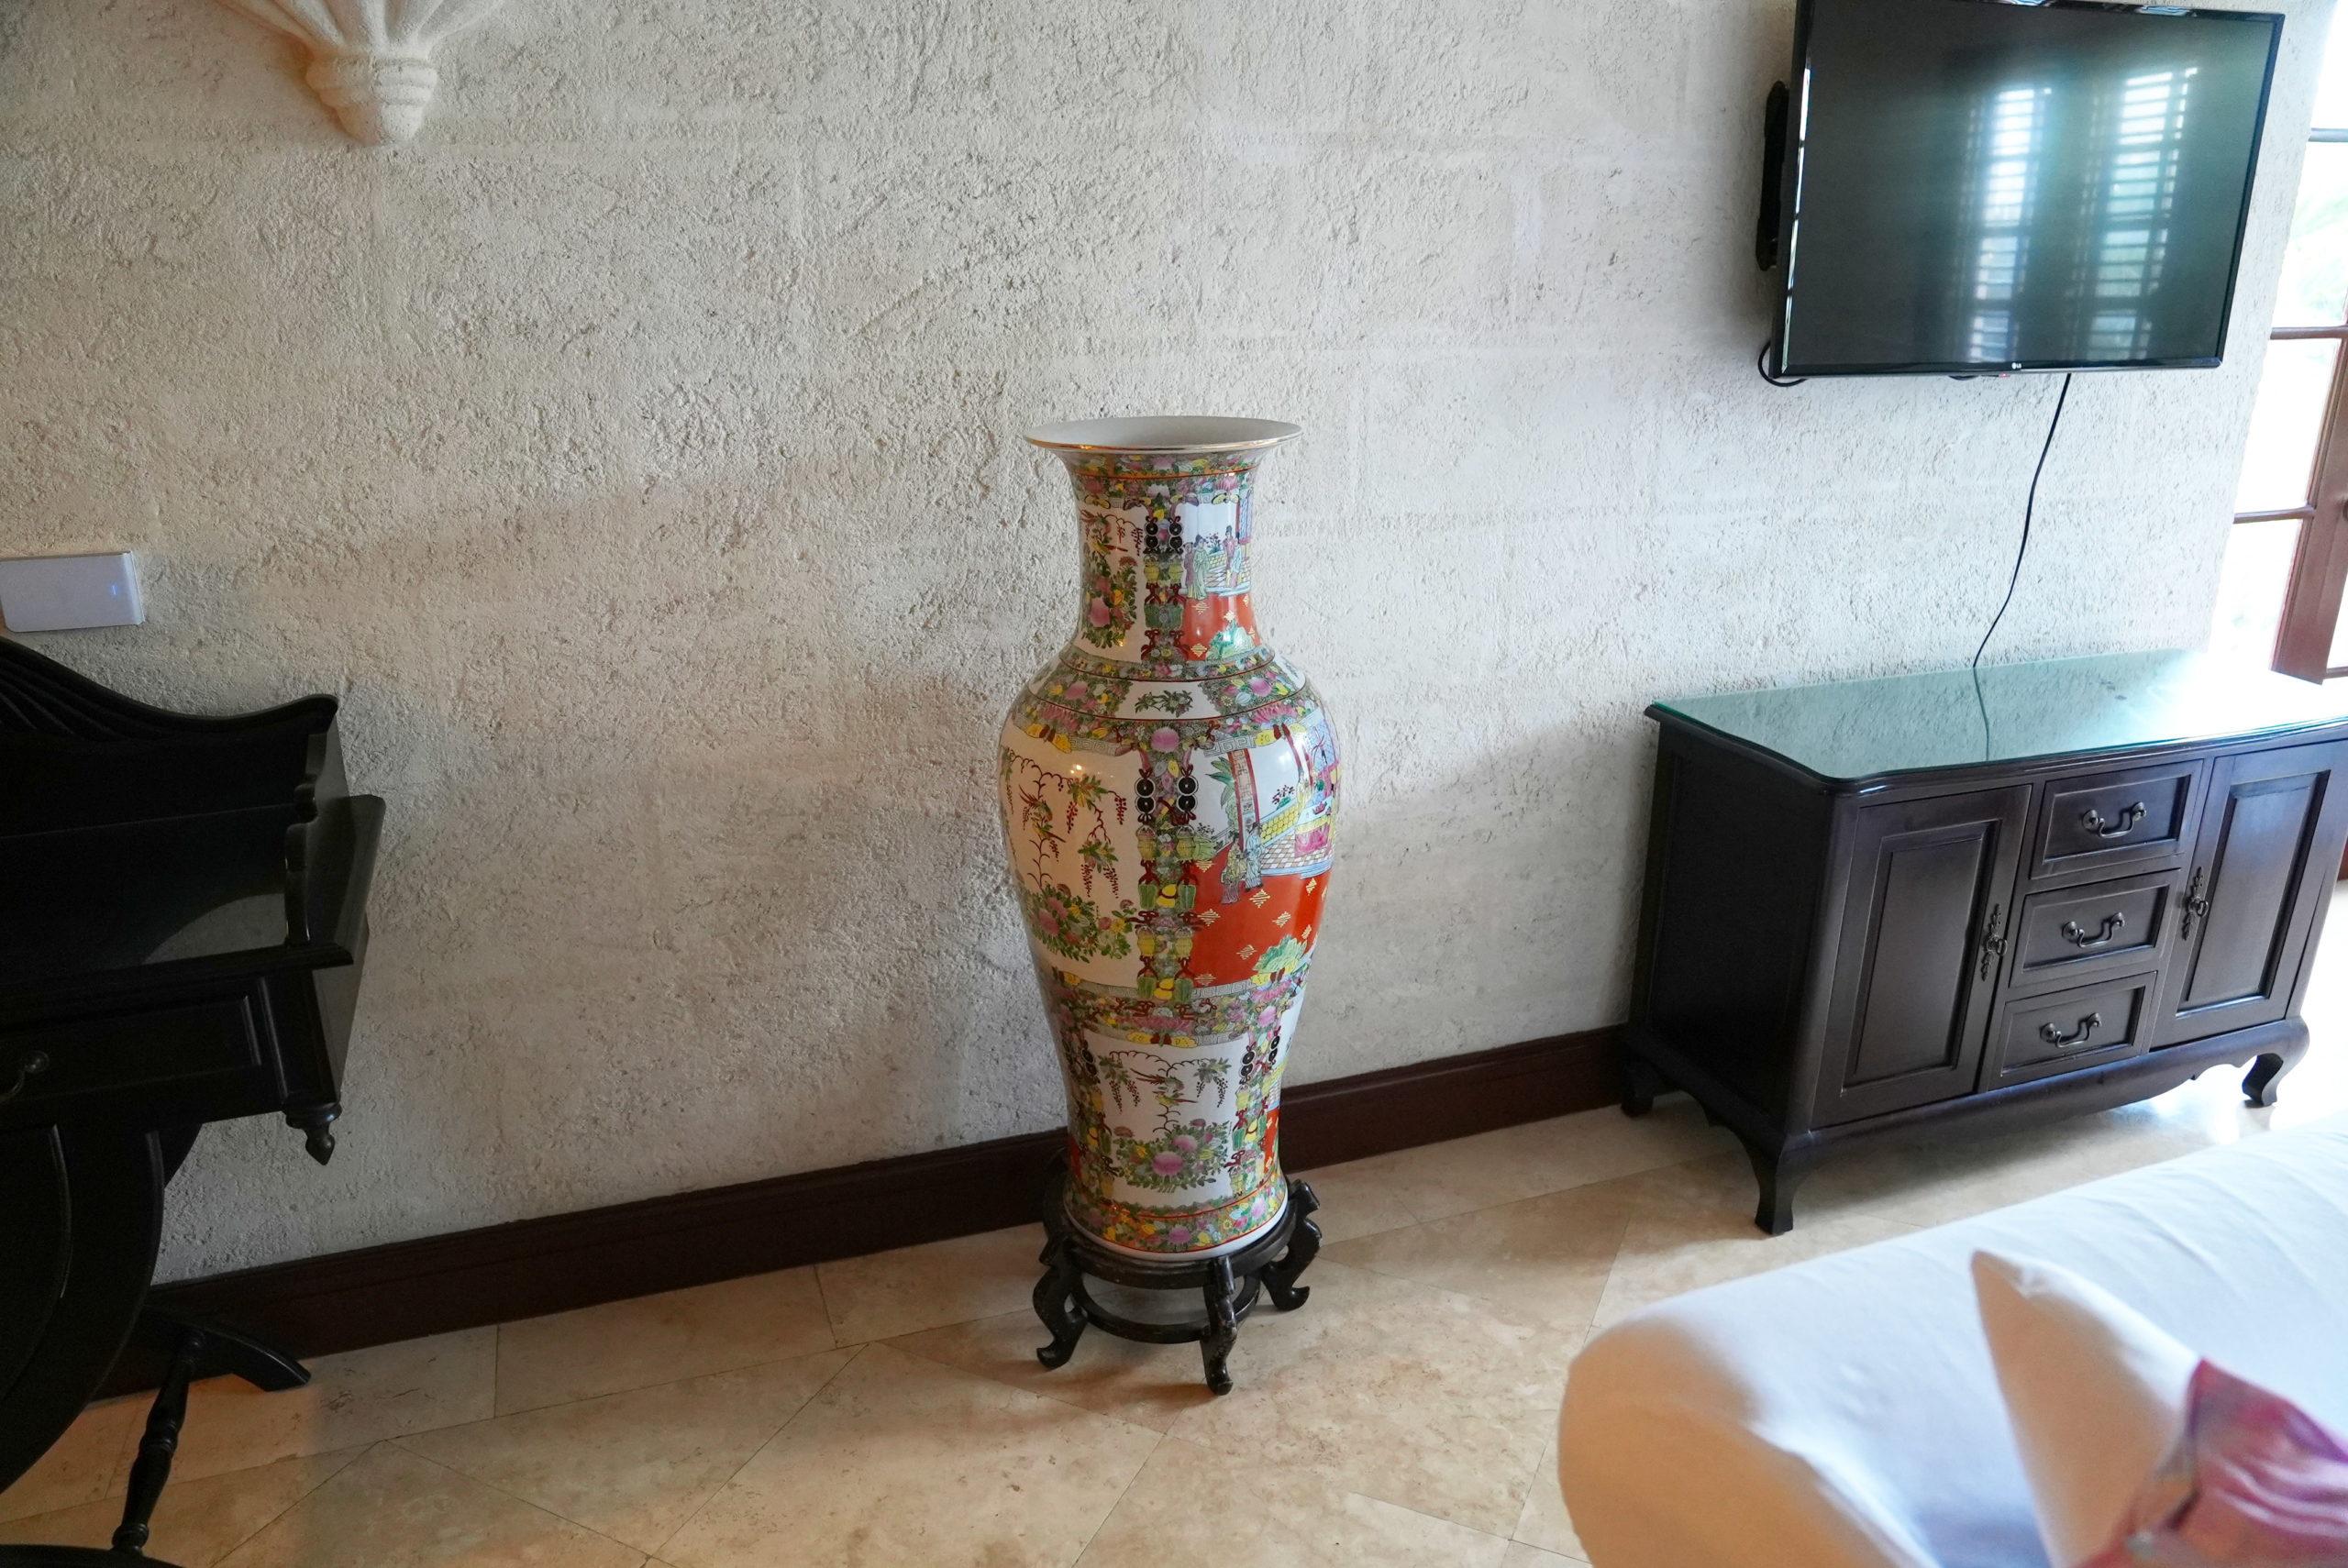 The comedy vase.